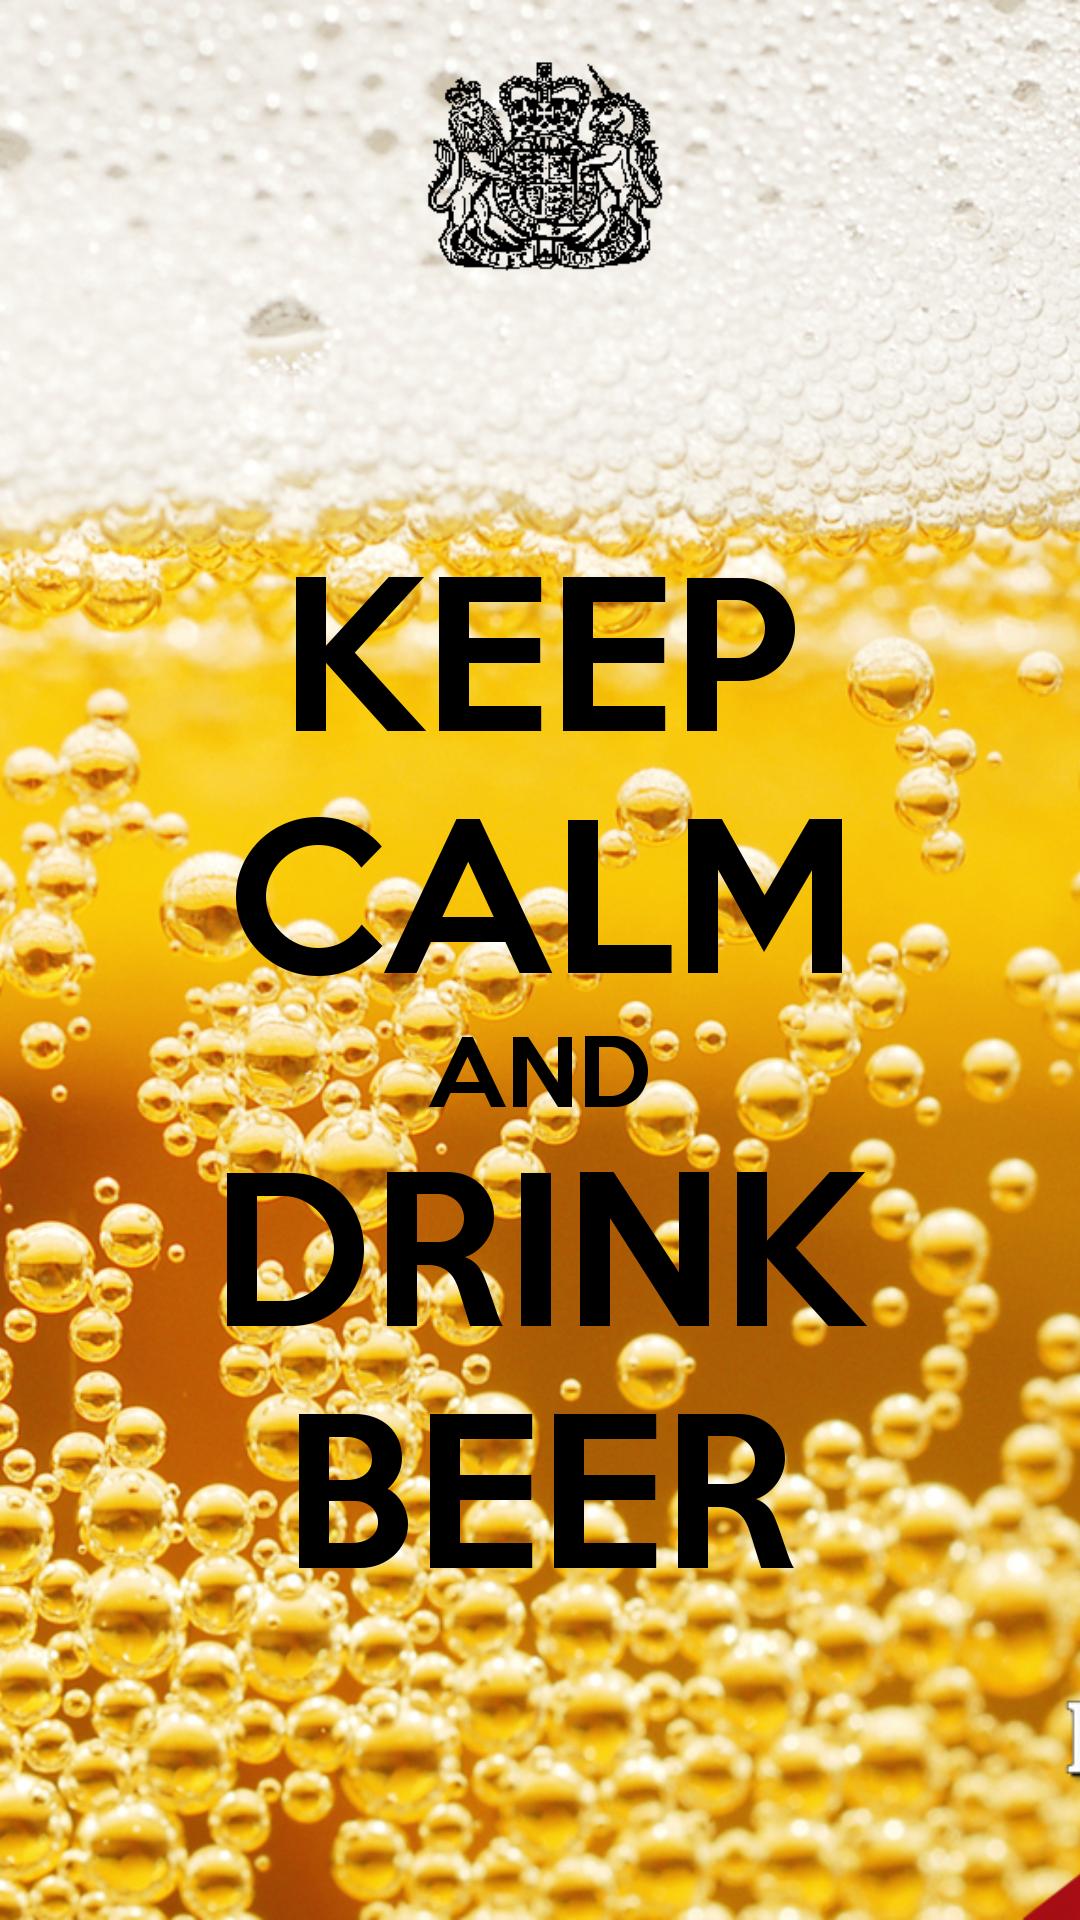 Keep calm and drink beer.   Octoberfest!!!!!   Pinterest   Drink beer